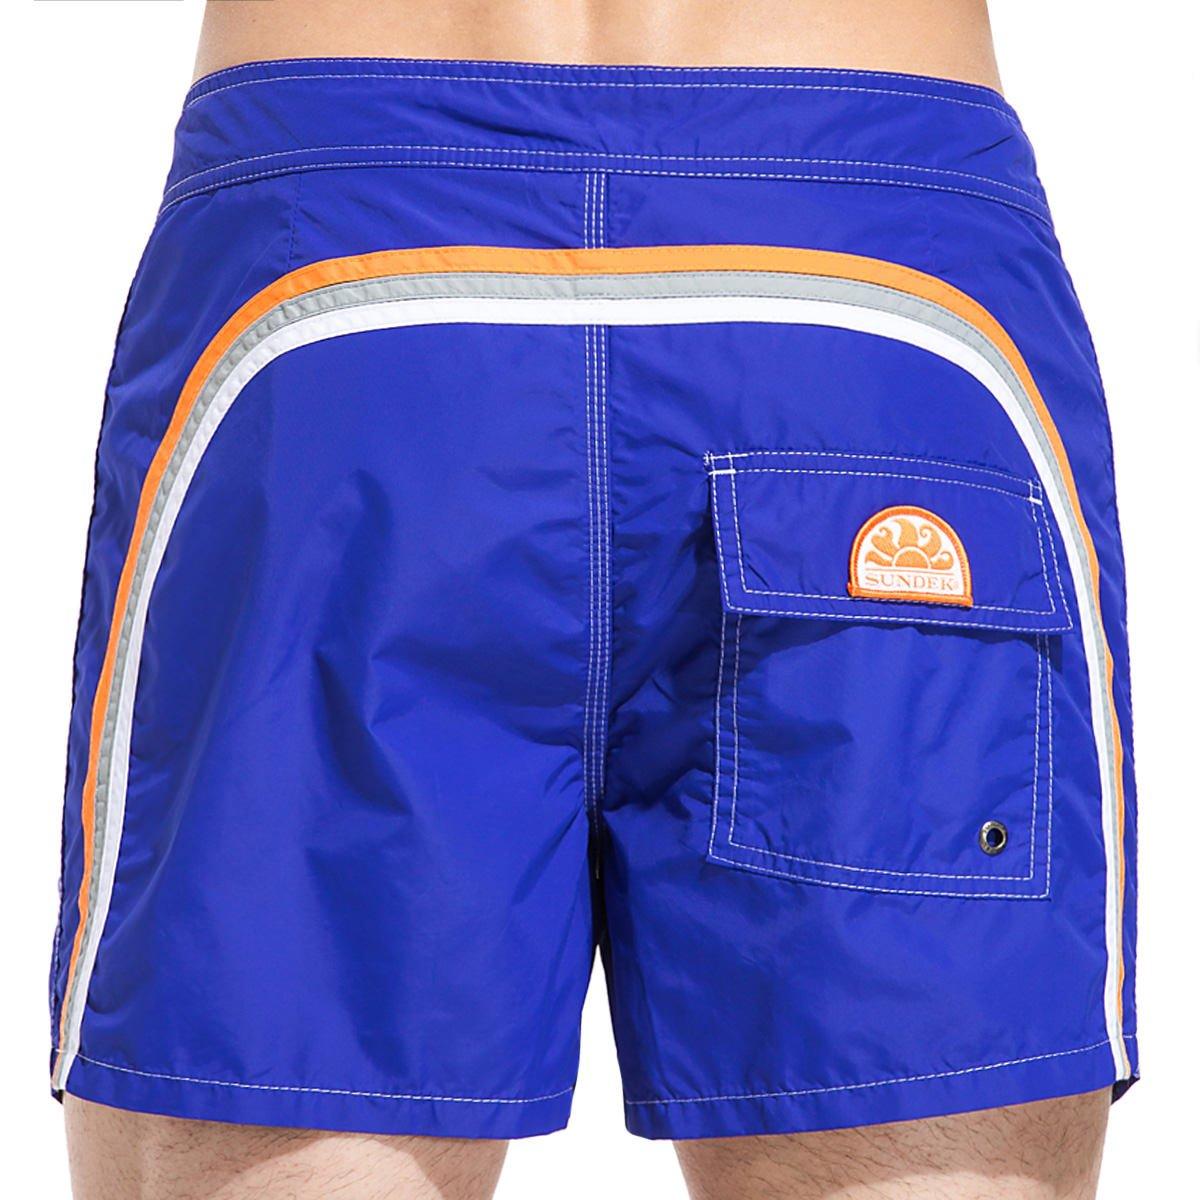 SUNDEK m502bdta100 Niedrig Rise 14 477 True Blau Board-Short Beachwear